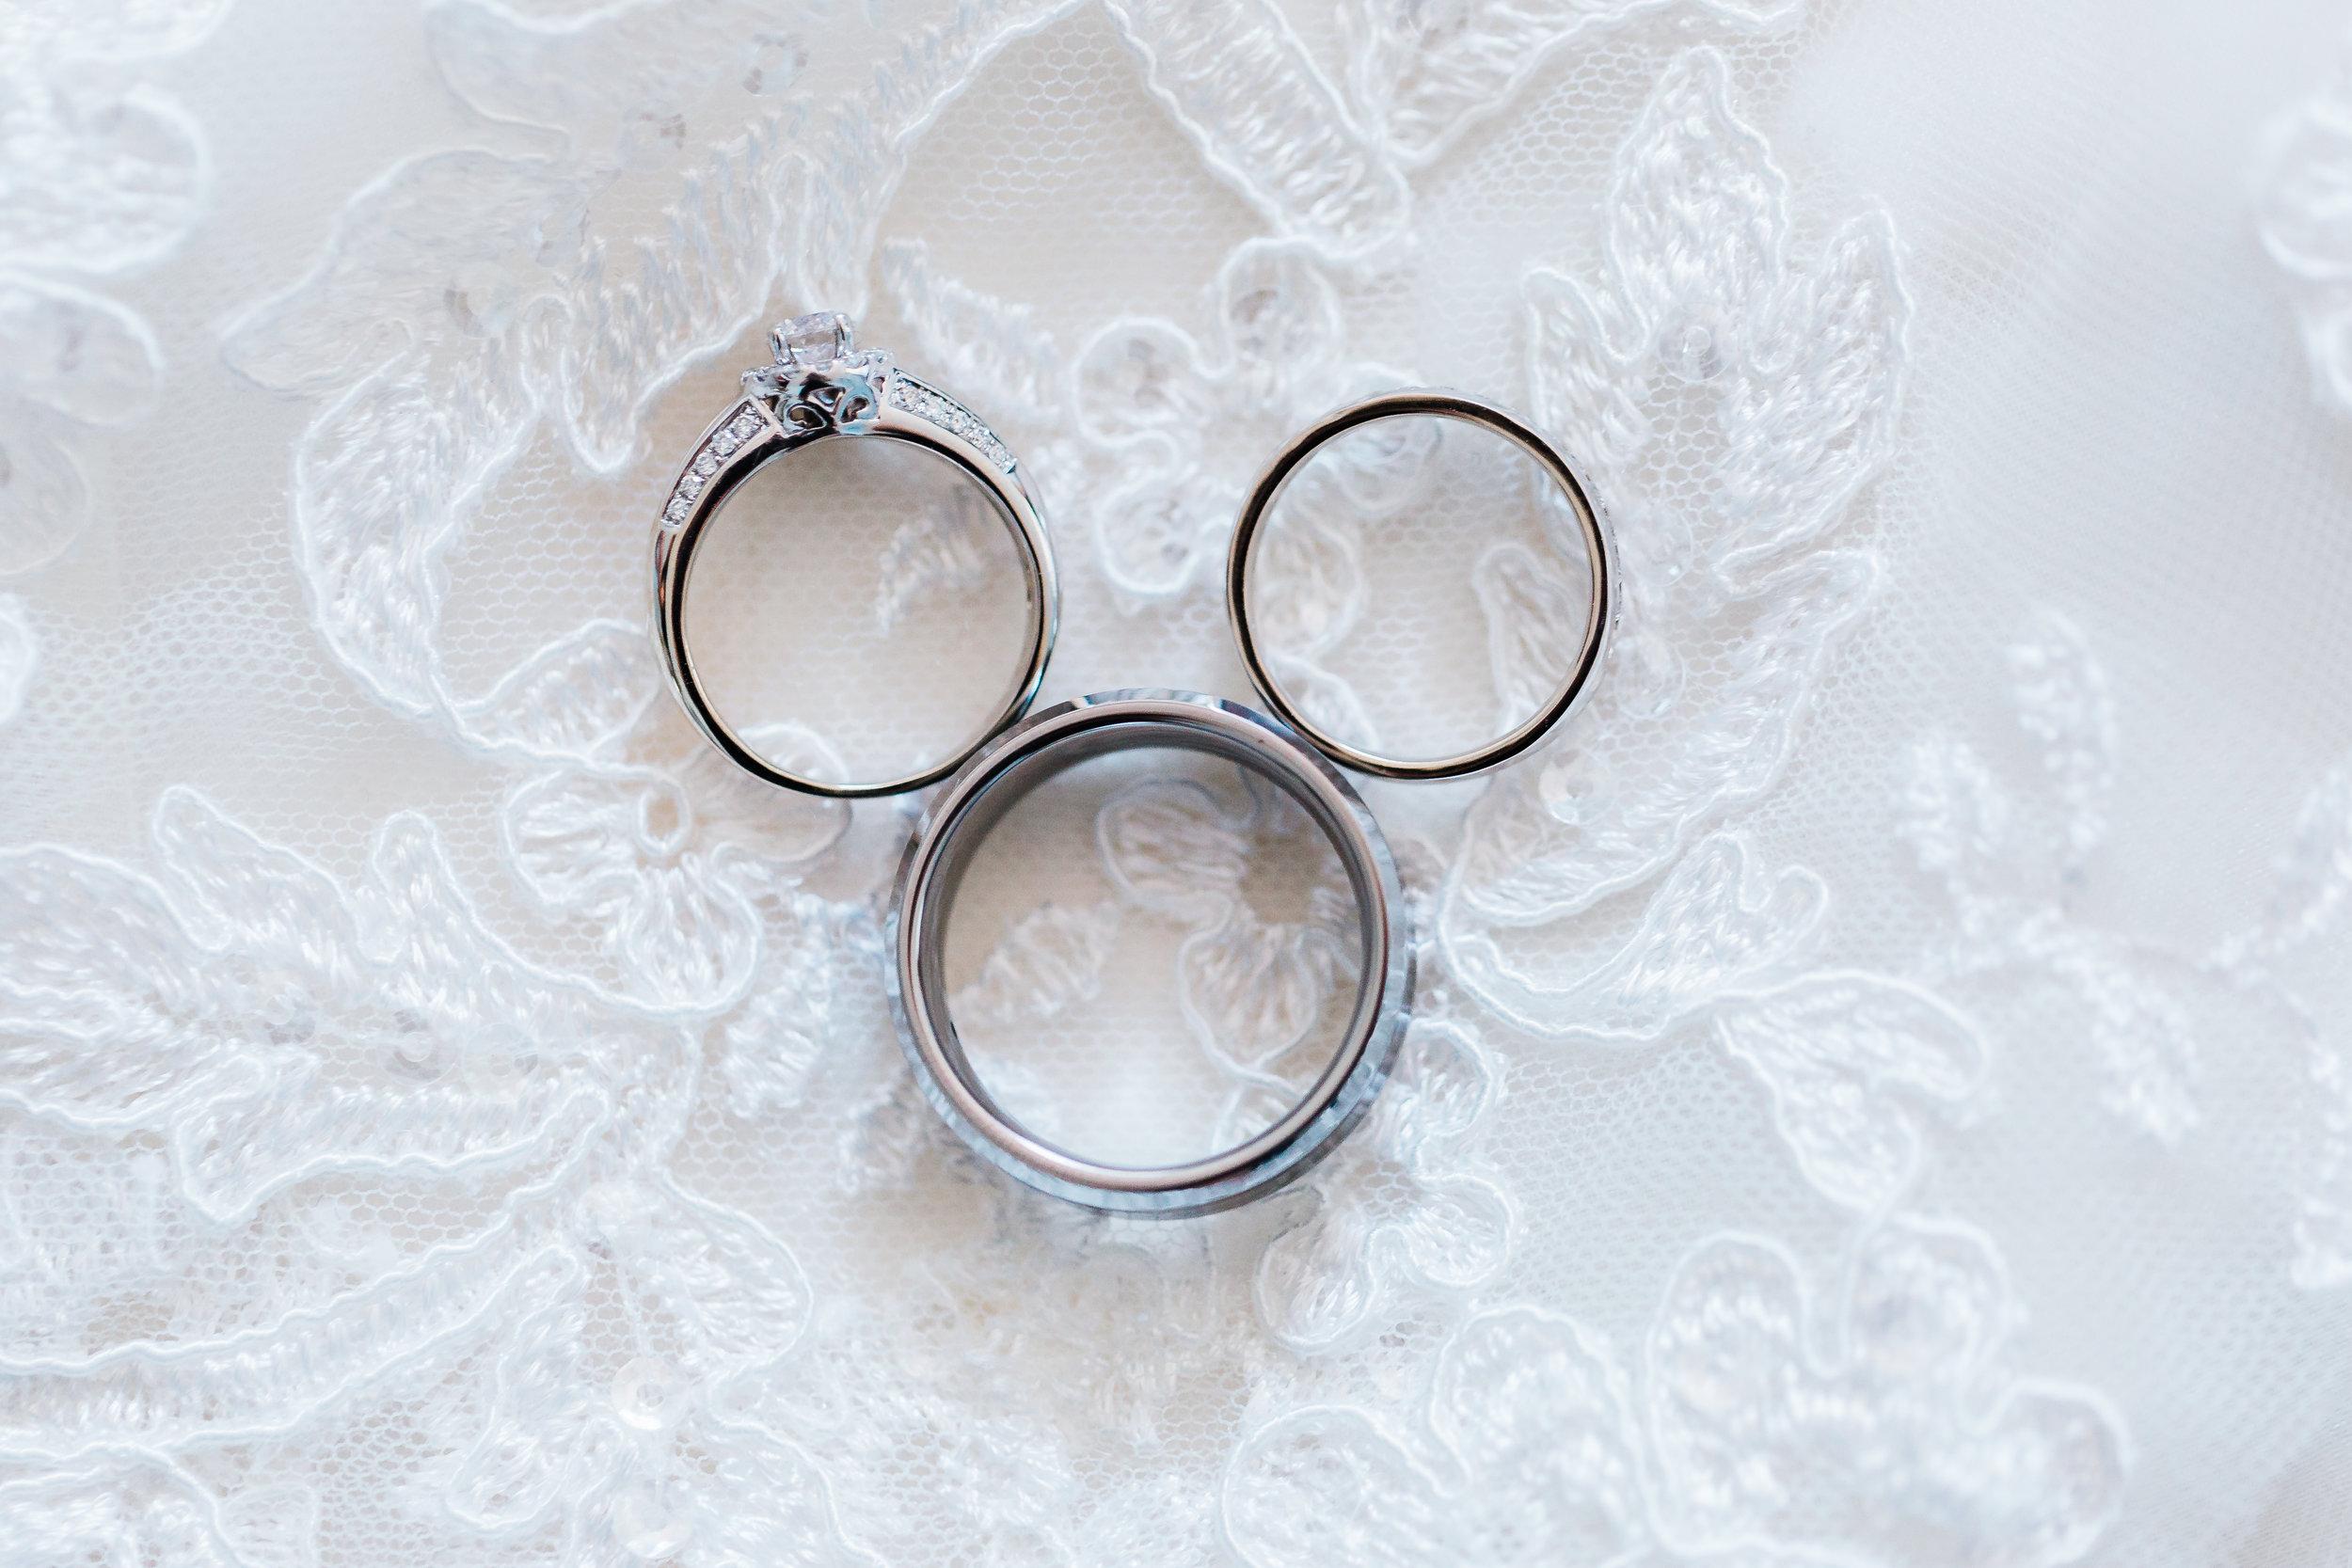 mickey mouse wedding rings - maryland wedding - best md wedding photographer - md wedding photo and film / video